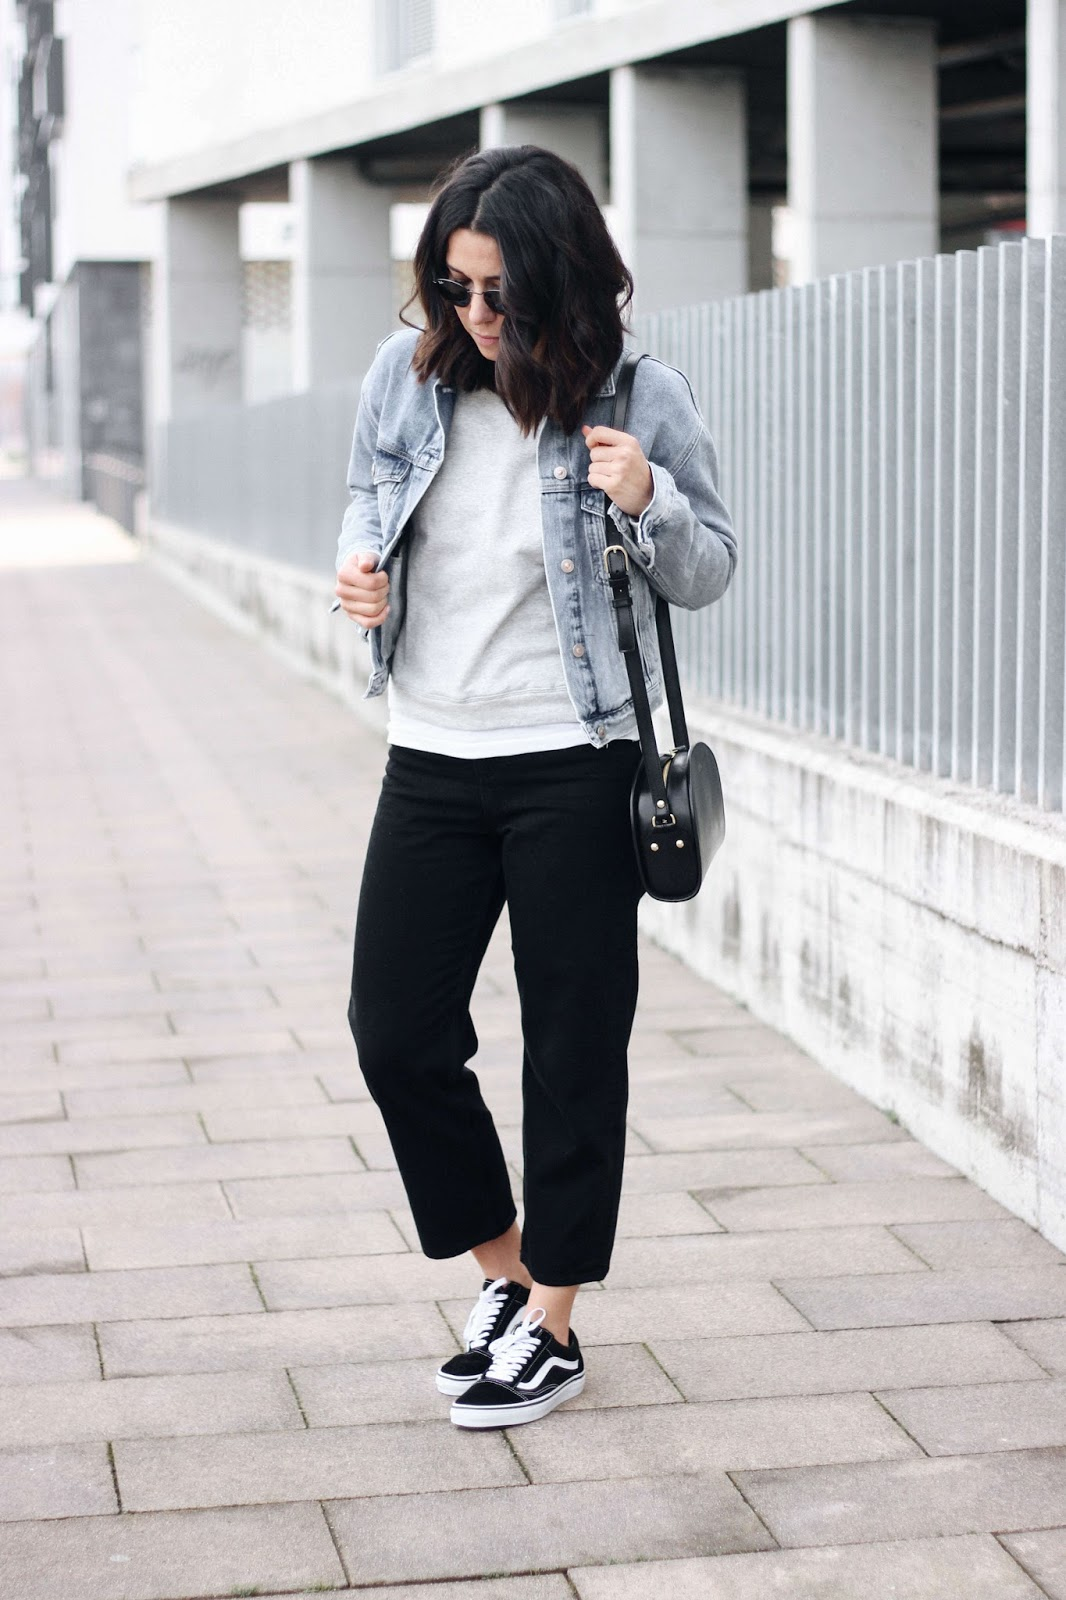 92e0ead3 JE ME CASSE   Romalo's blog   Fashion blogger   Laid back and ...